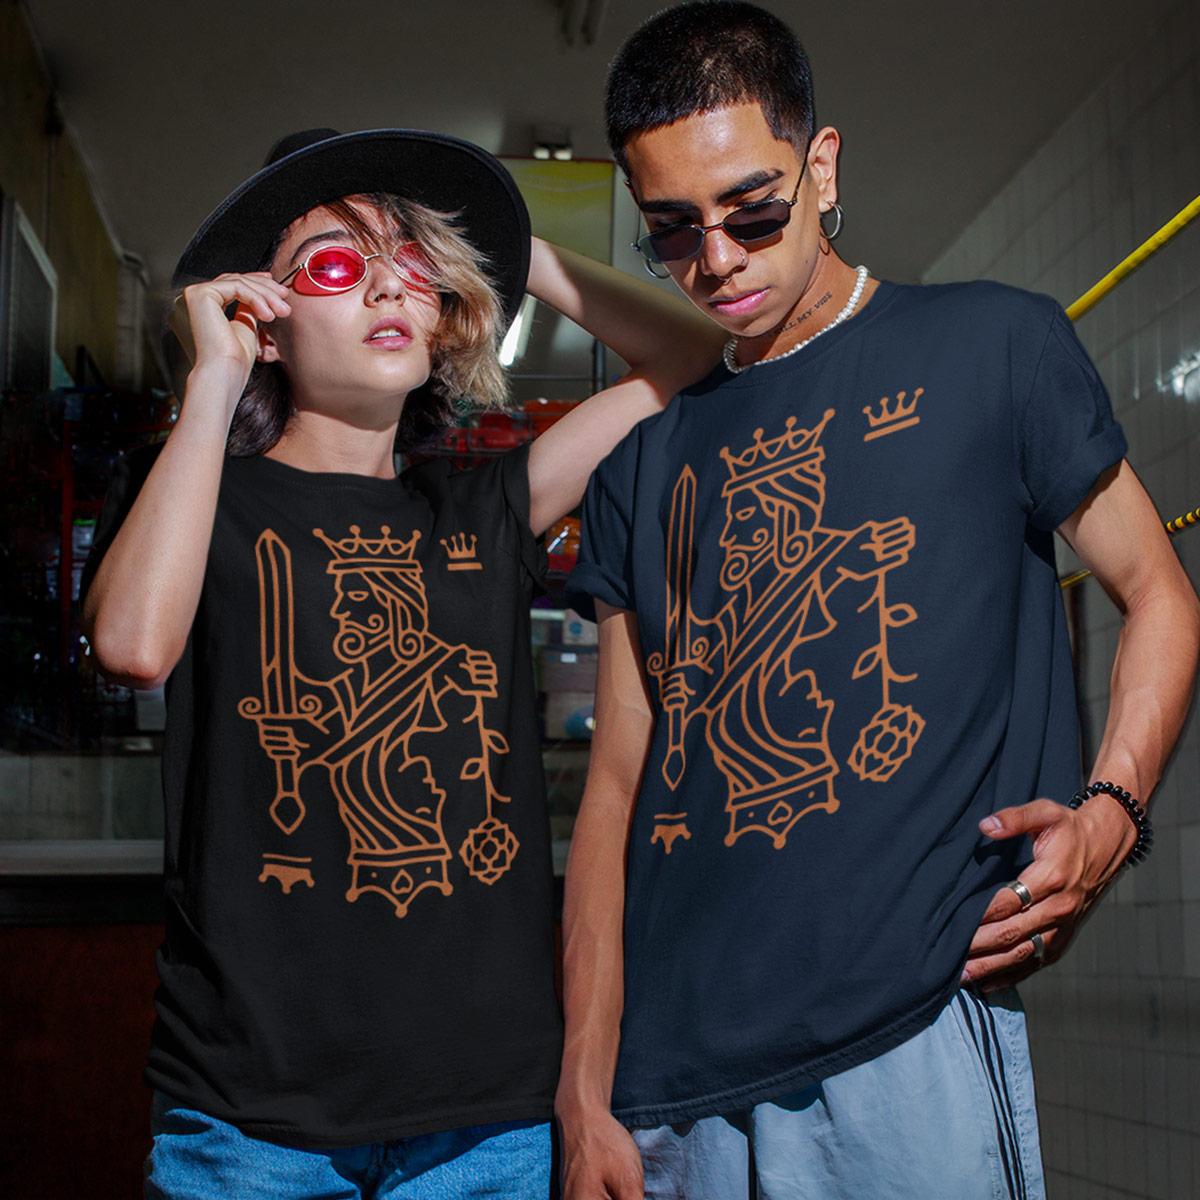 Kings top Queens Poker T-Shirt